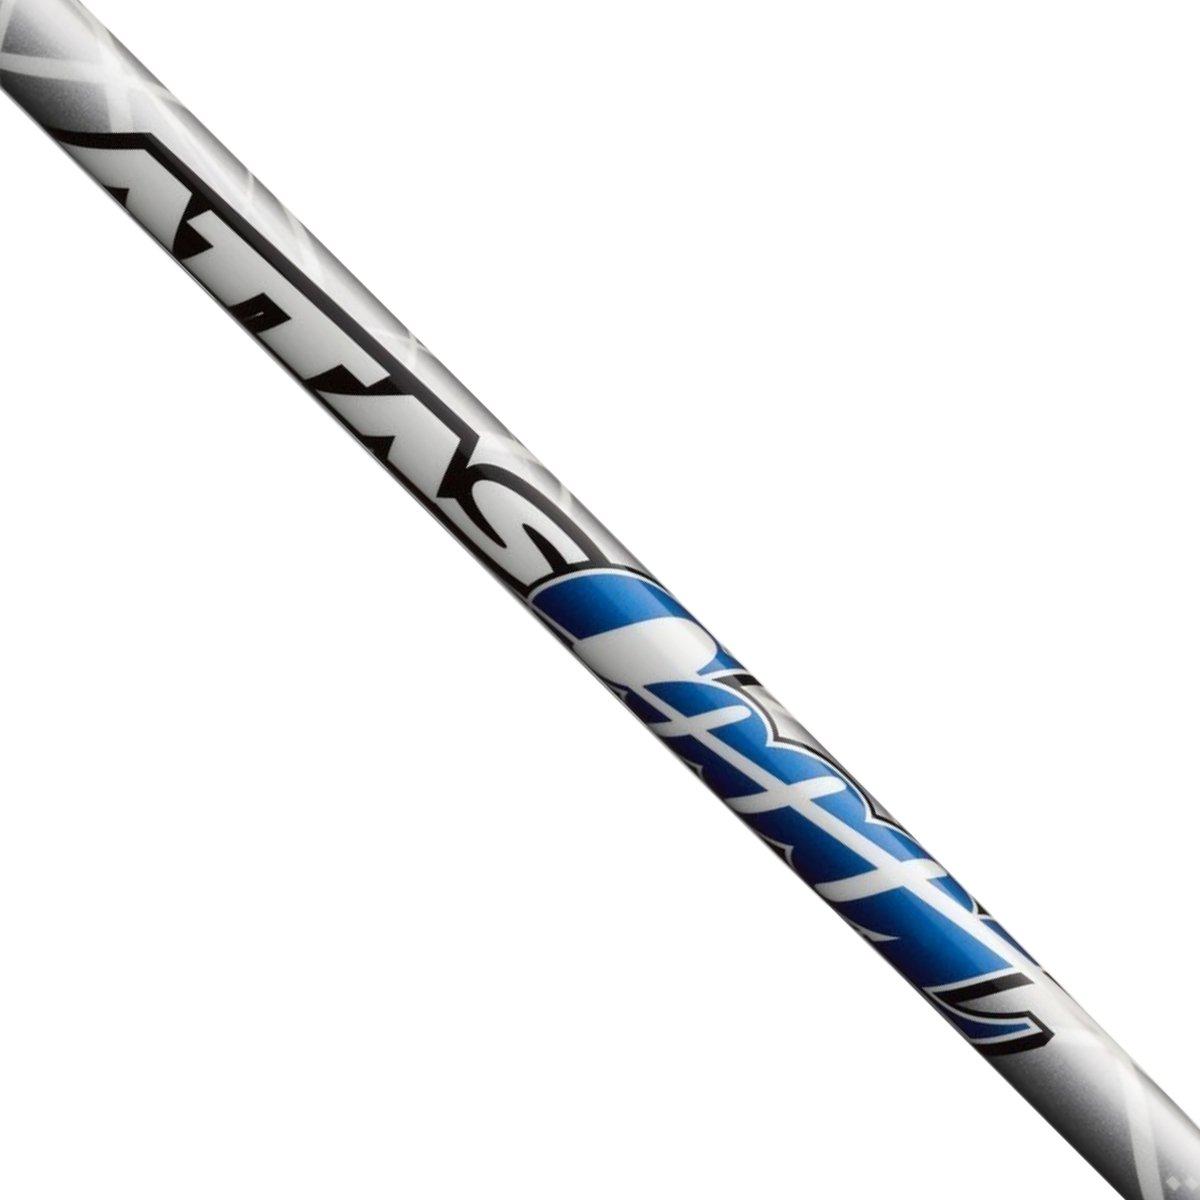 Mamiya Attas coool-7ドライバーシャフト – .335 Tip – Choose your Flex B076DV119C  S-74g-46インチ